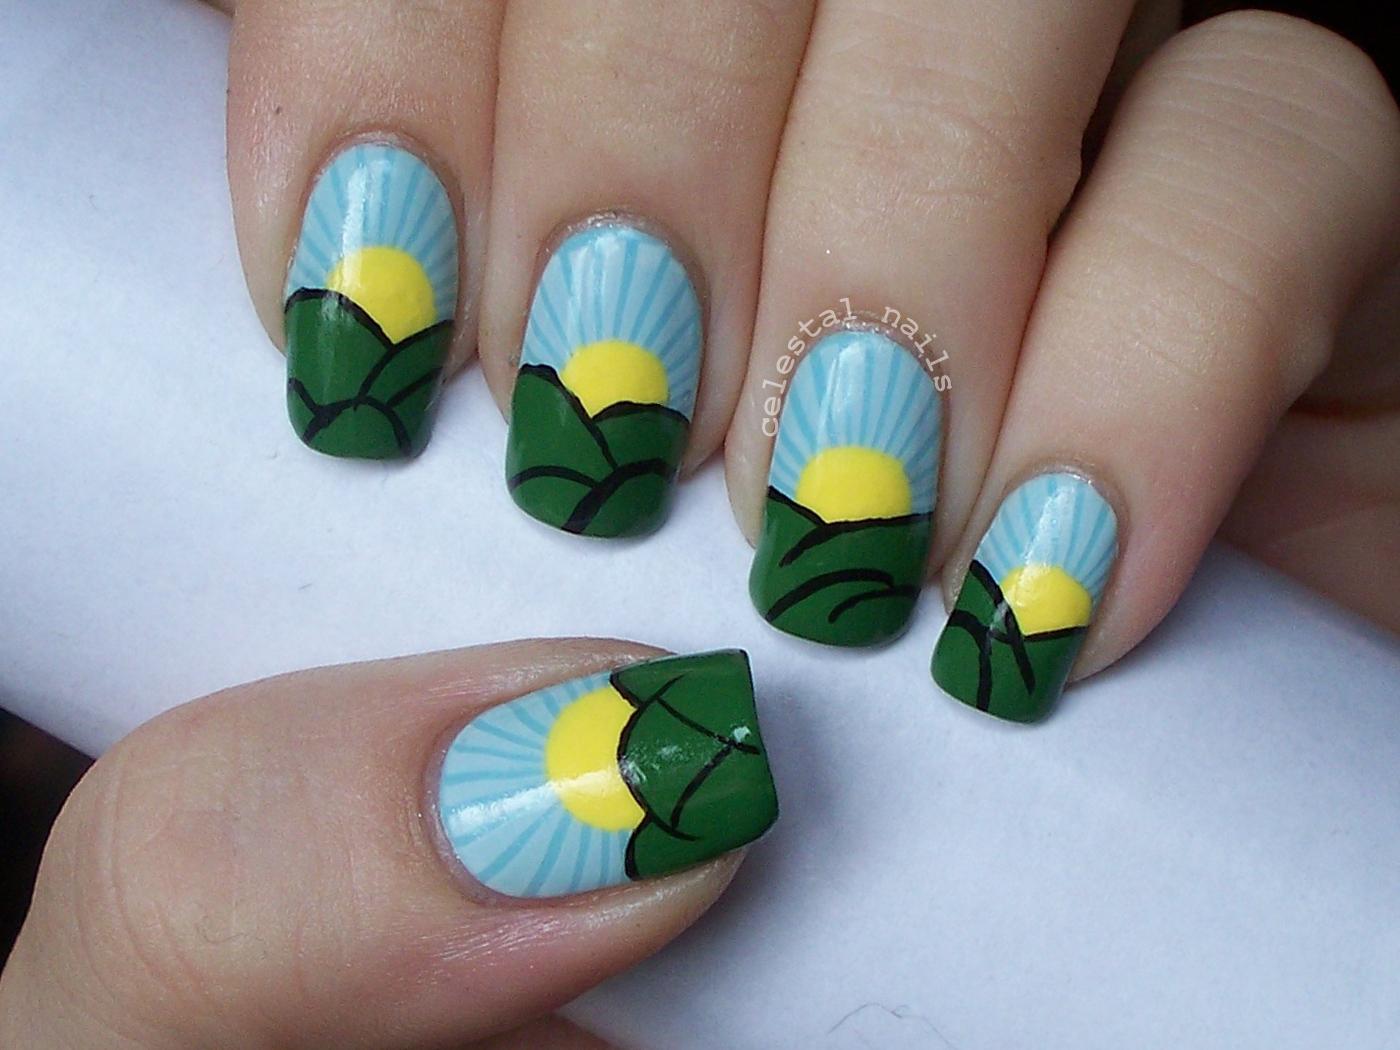 Sunny Days Nail Art | Celestal Nails